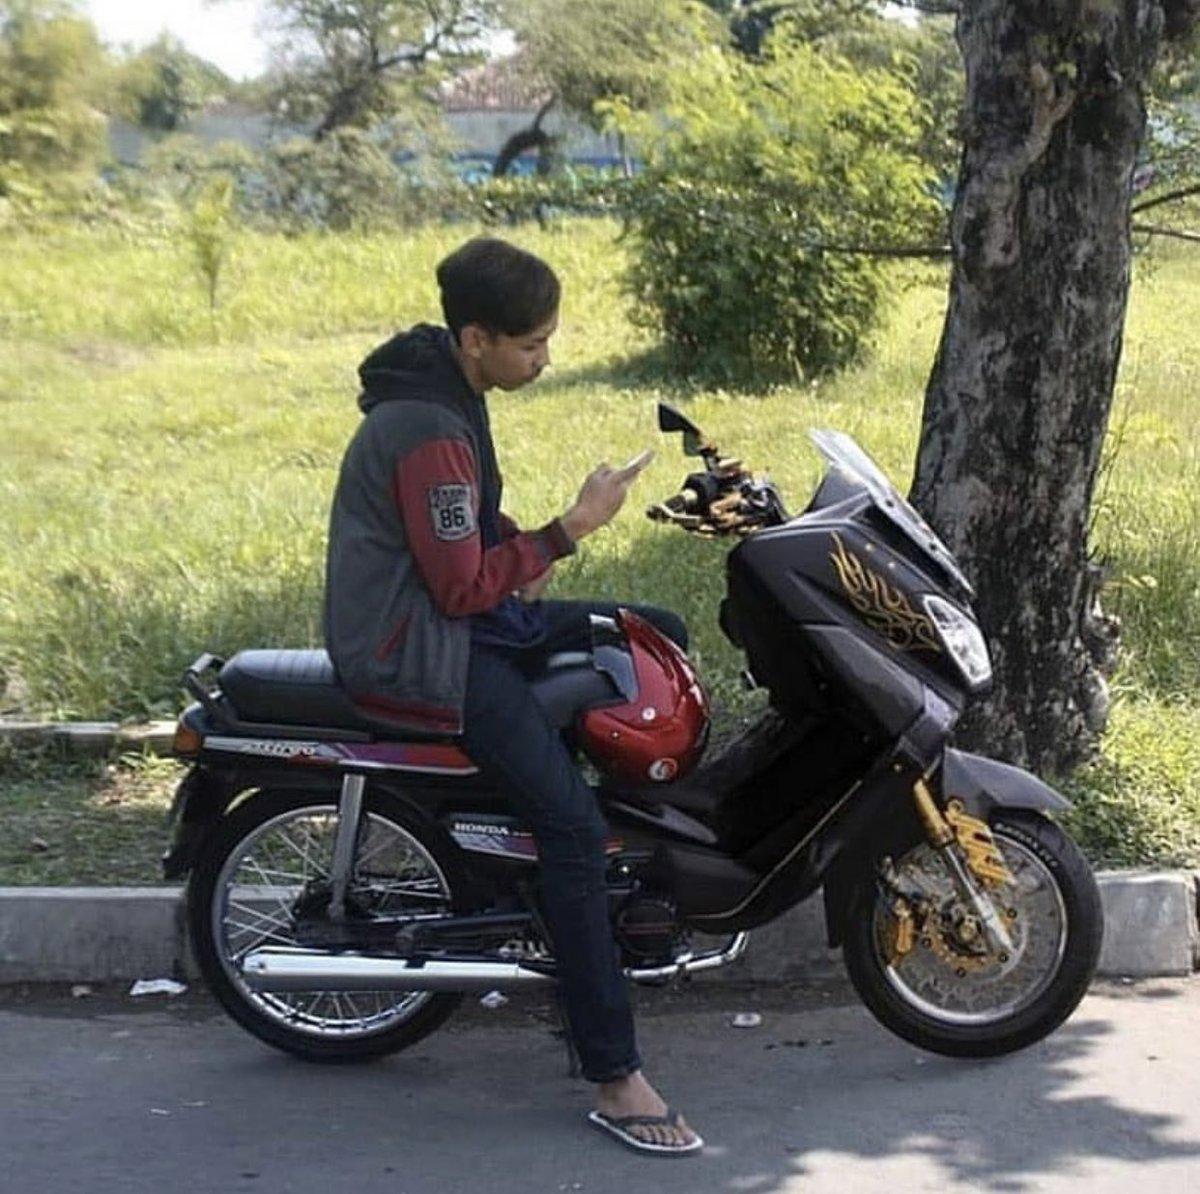 Honda Astrea Grand-max.  Source IG: pecintamotortuaid <br>http://pic.twitter.com/fDNWjbU99X